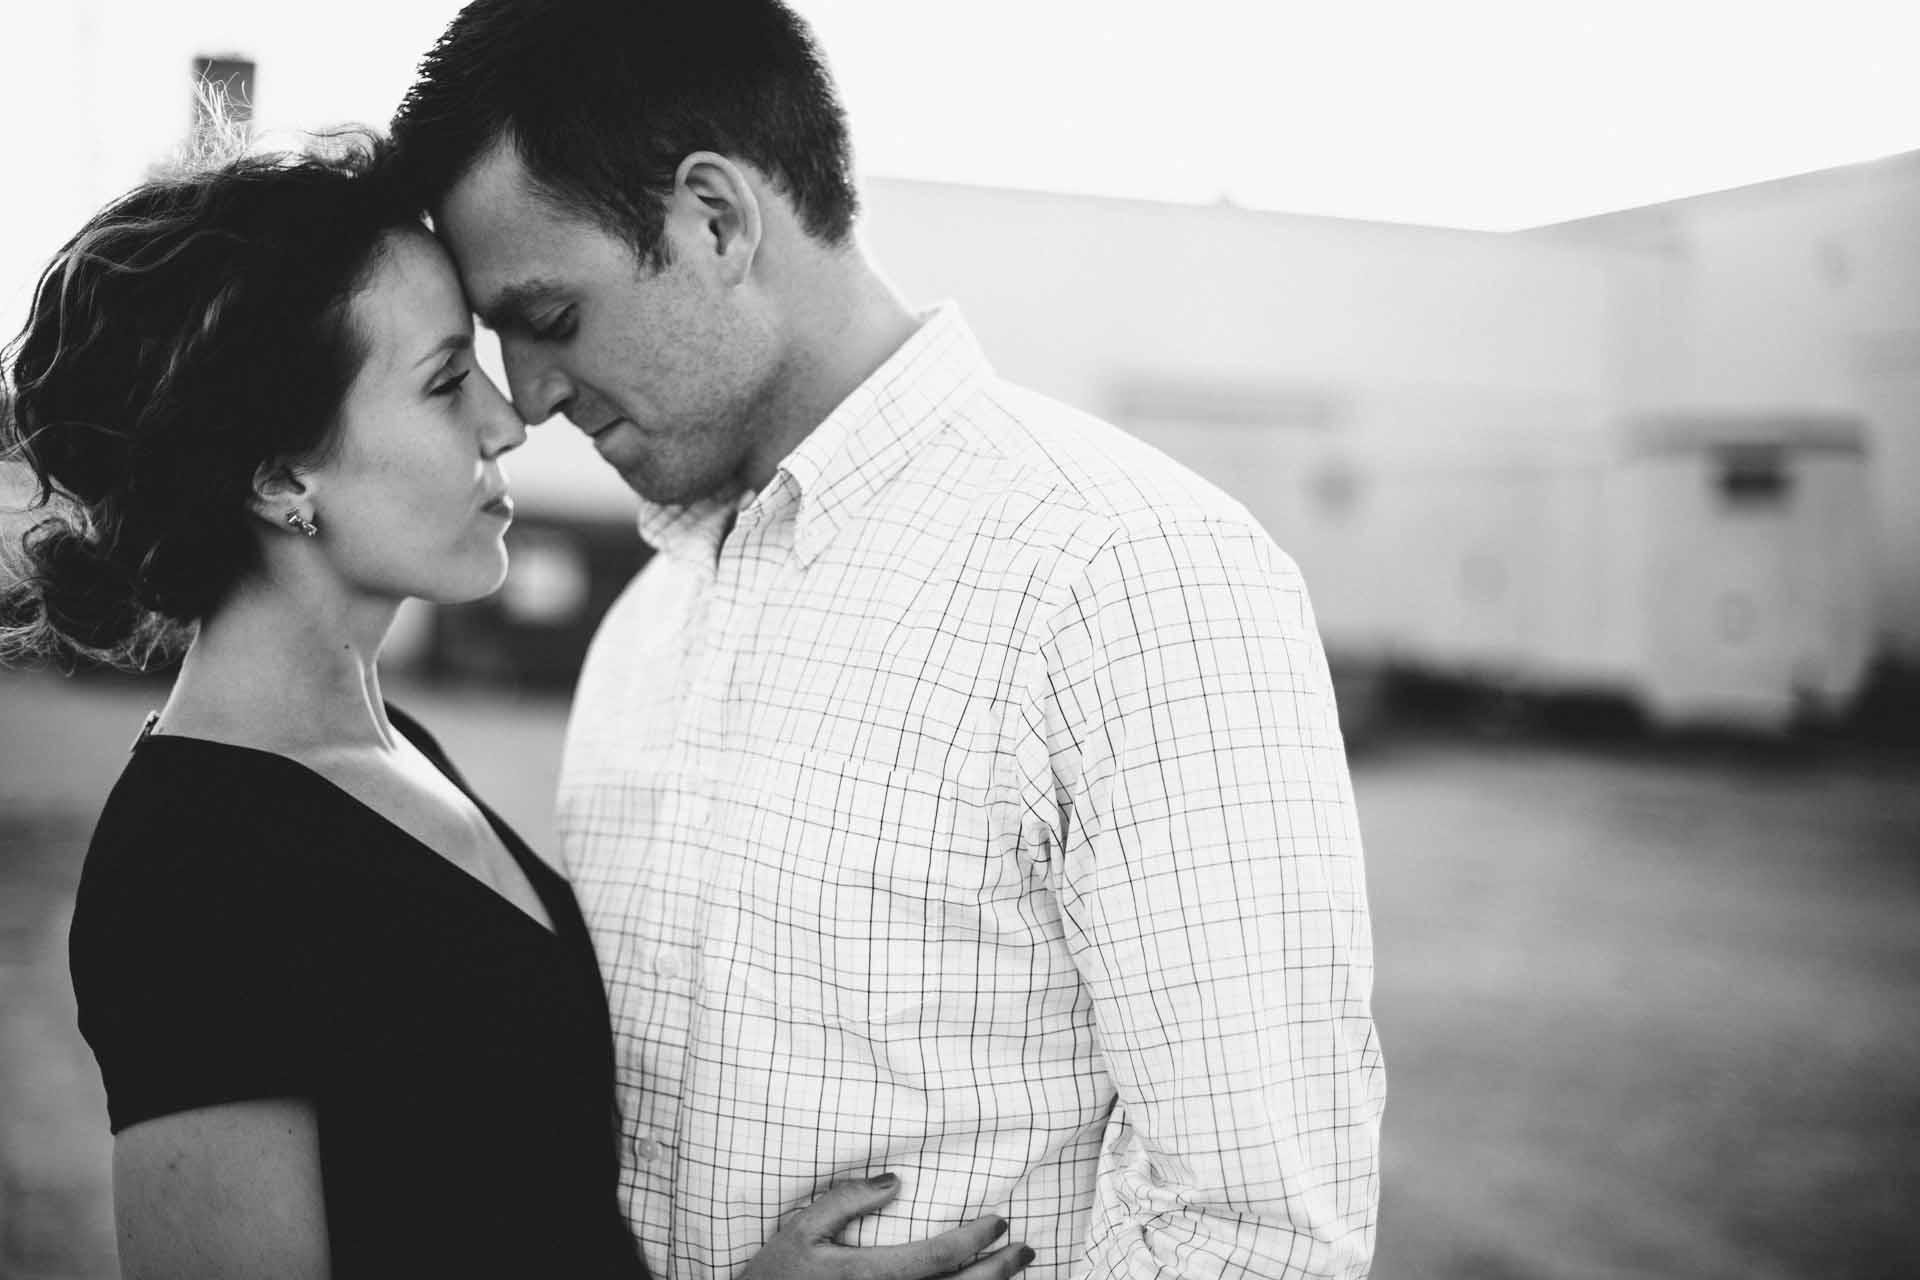 Emily-Dan-Dayton-Engagement-027@2x.jpg